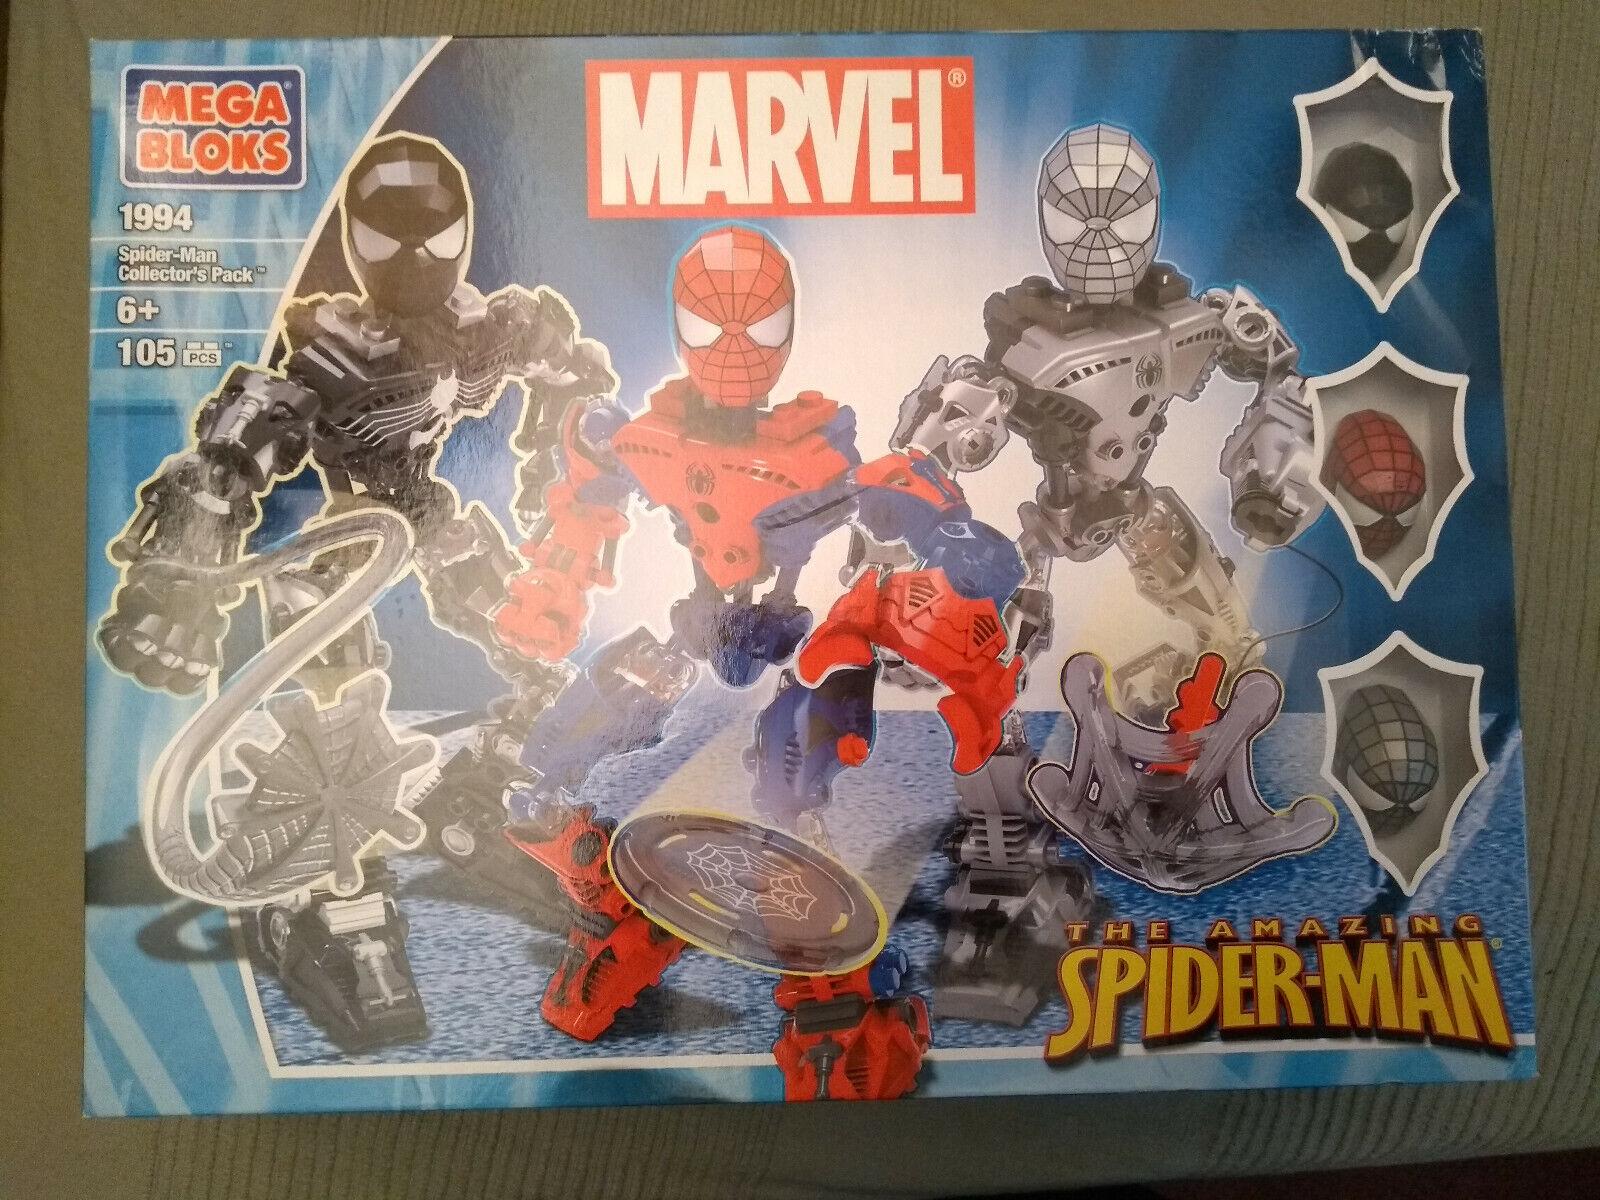 Spider-Man Venom Mega Bloks 1994 Armor Blok Blocks Block Not lego NEW Collectors